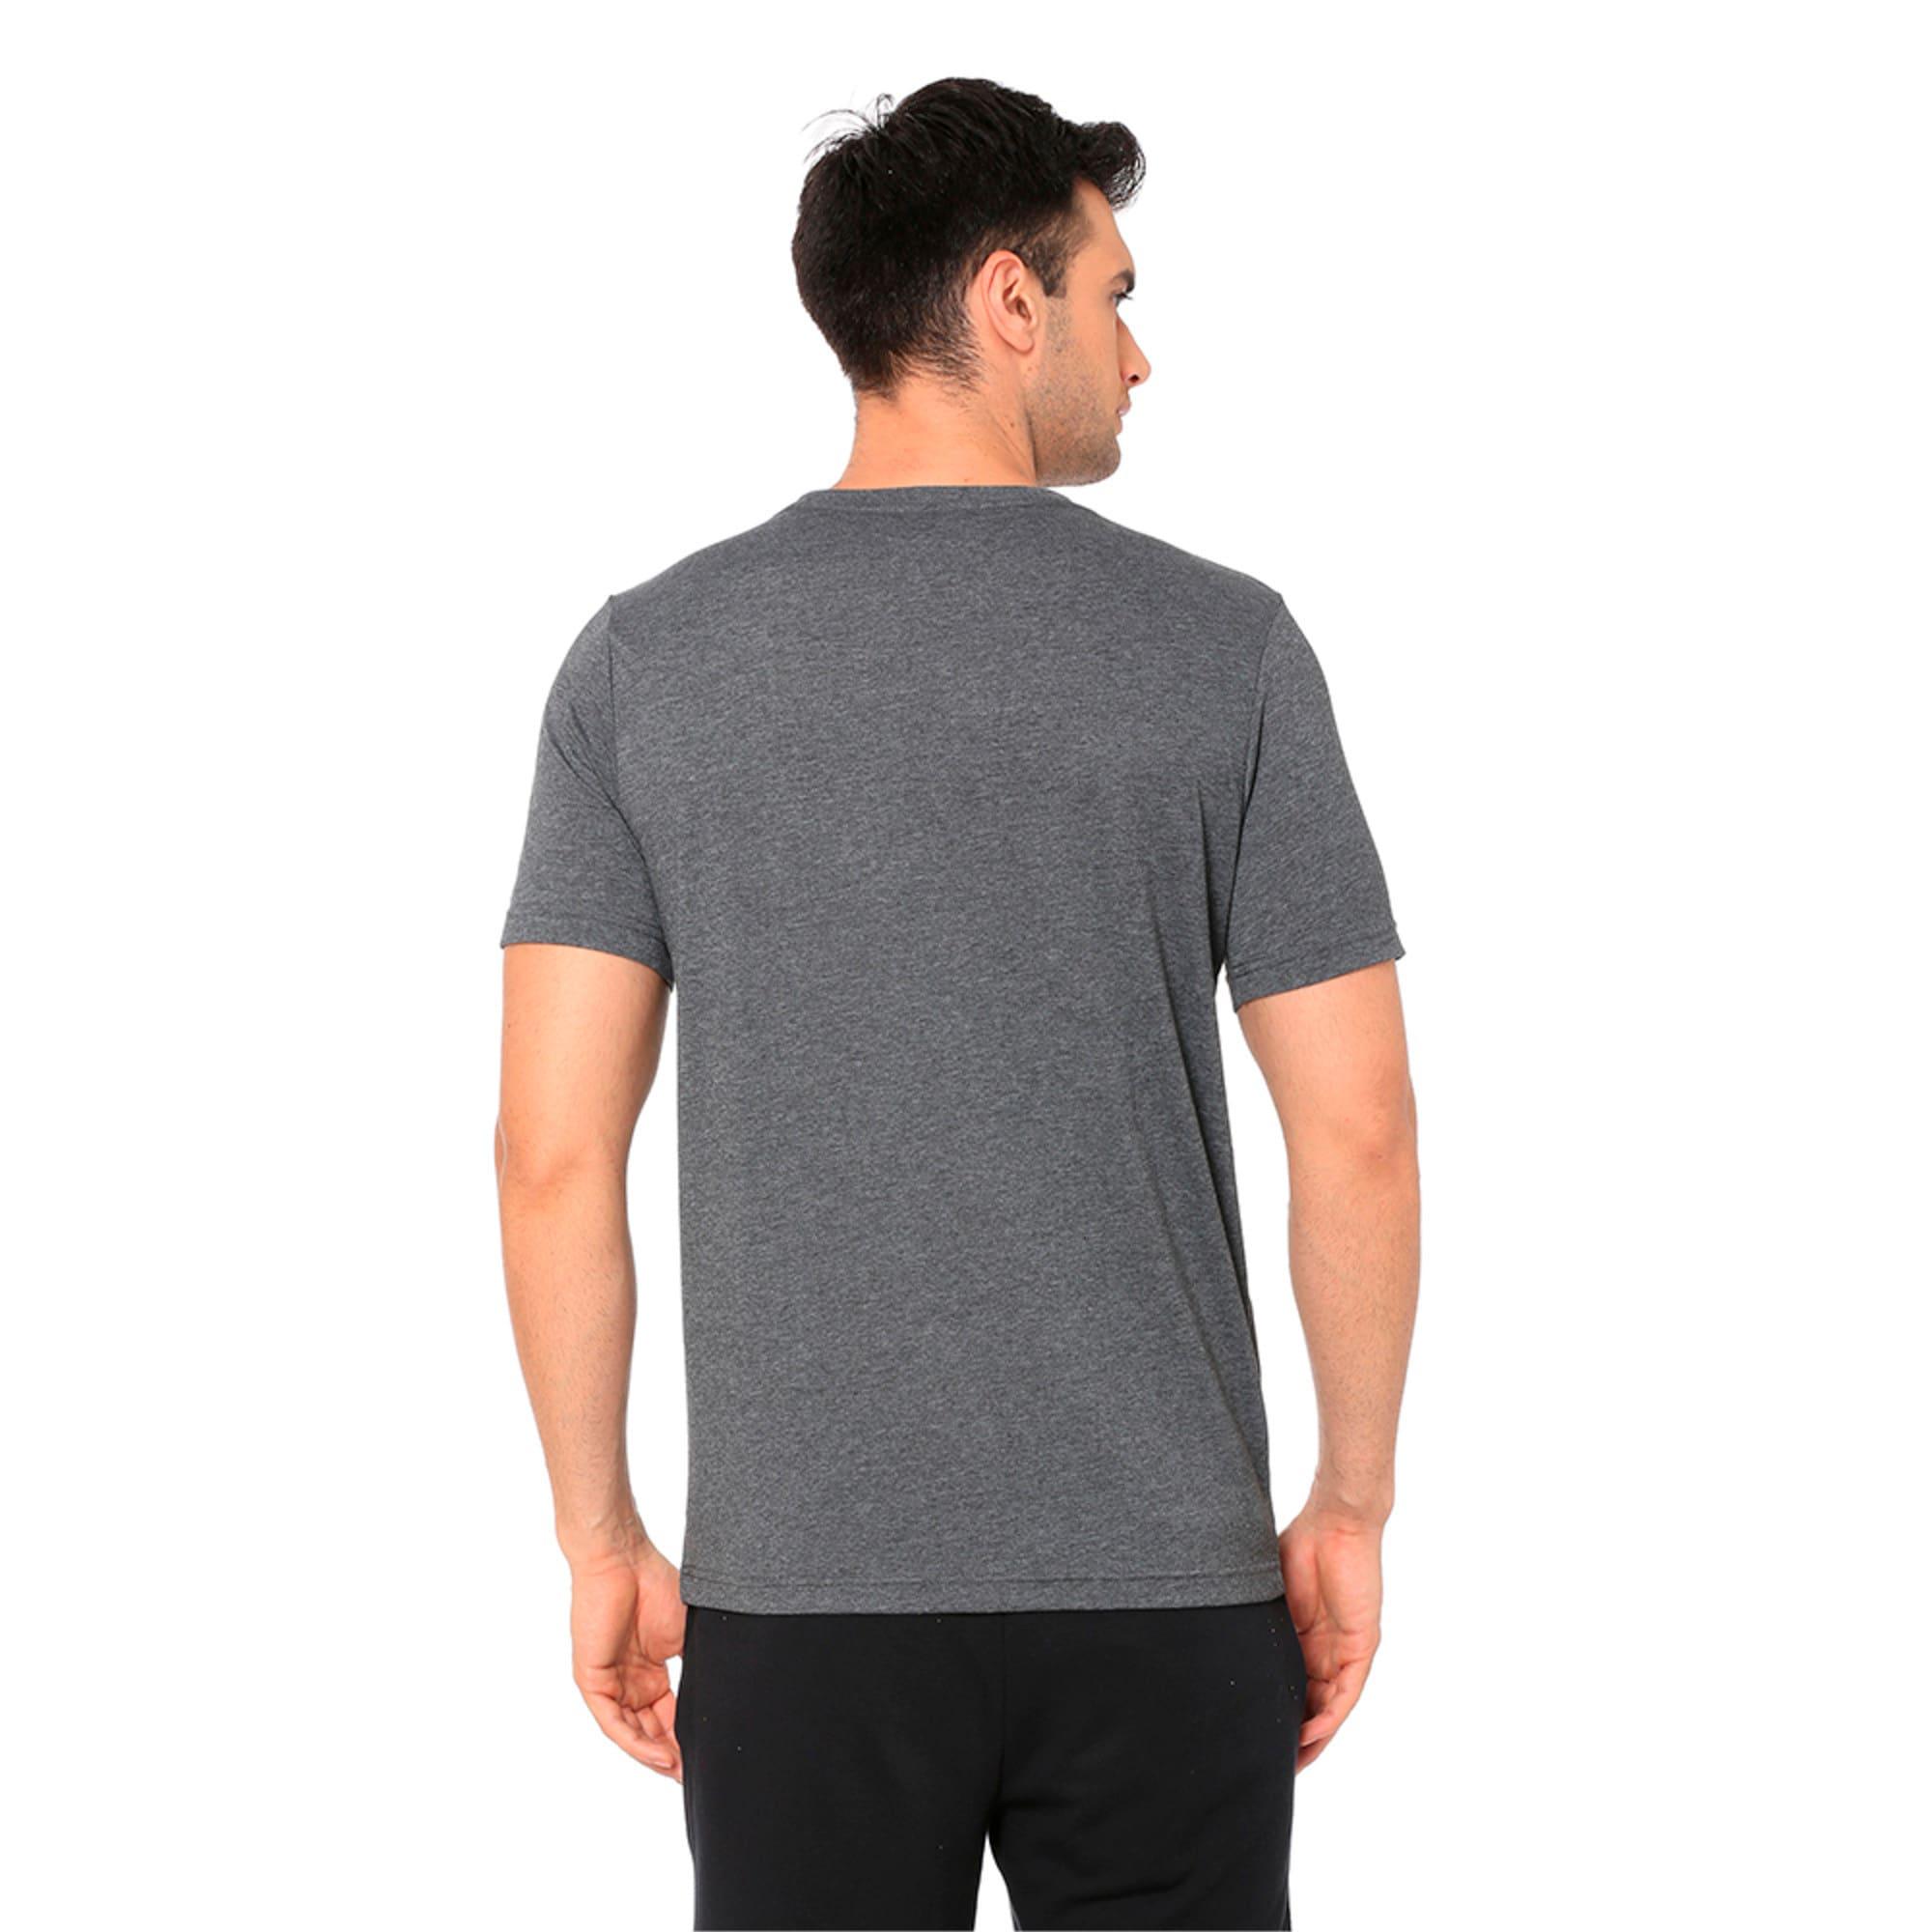 Thumbnail 5 of Men's Big Cat Heather T-Shirt, Puma Black Heather, medium-IND